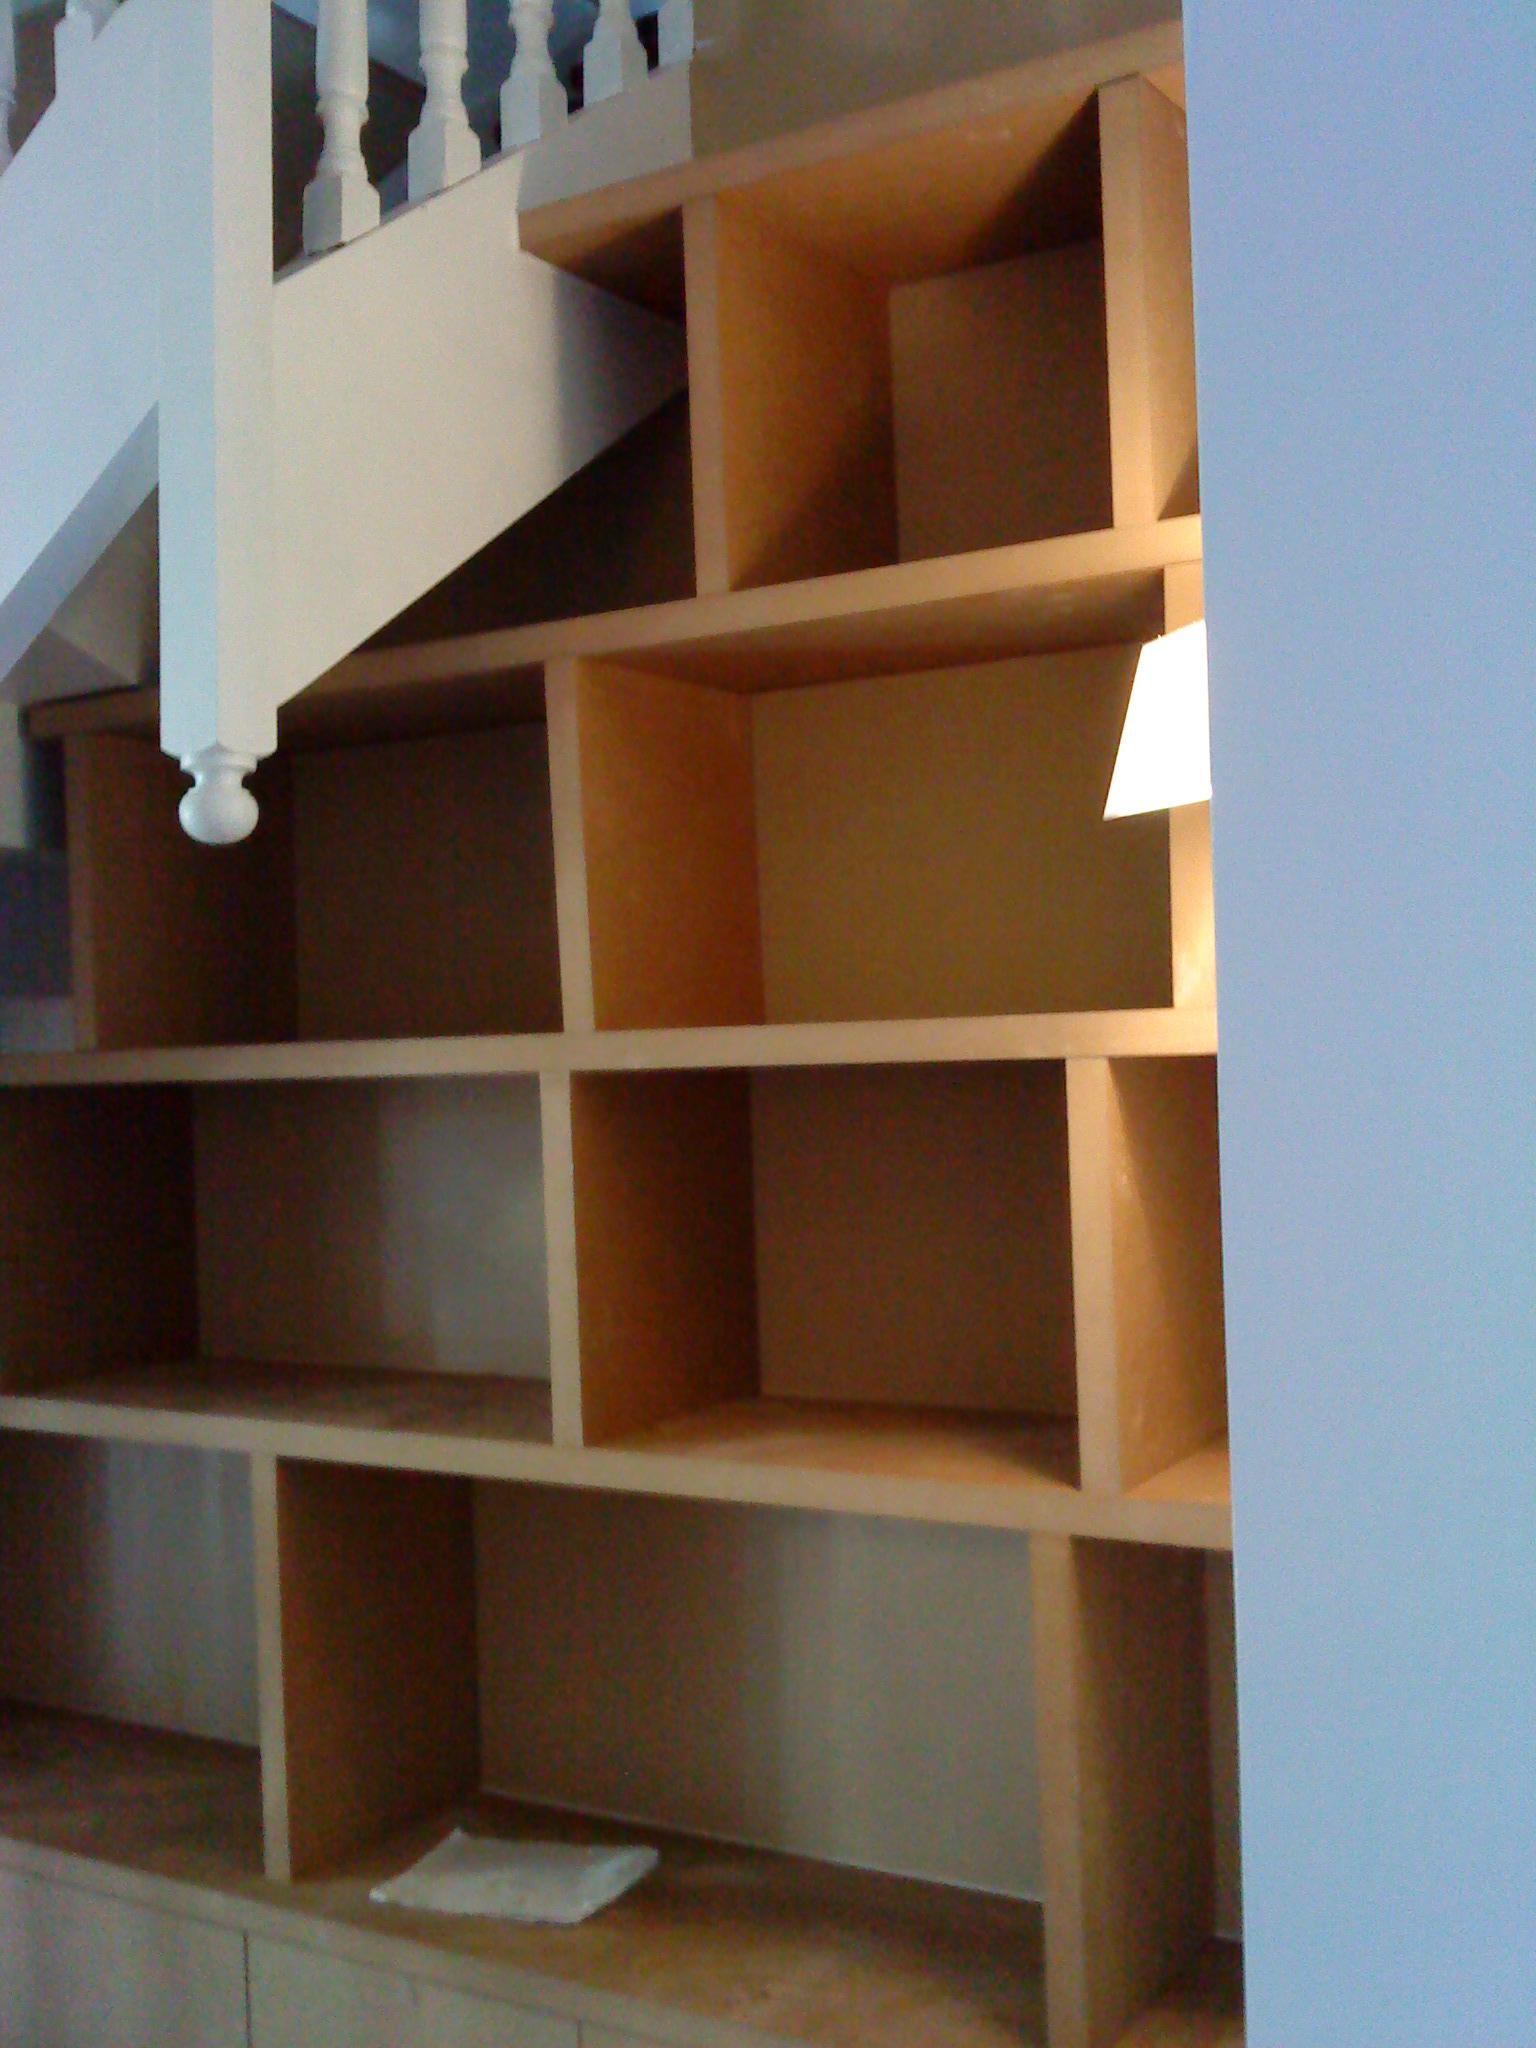 bibliotheque sous escalier bois. Black Bedroom Furniture Sets. Home Design Ideas